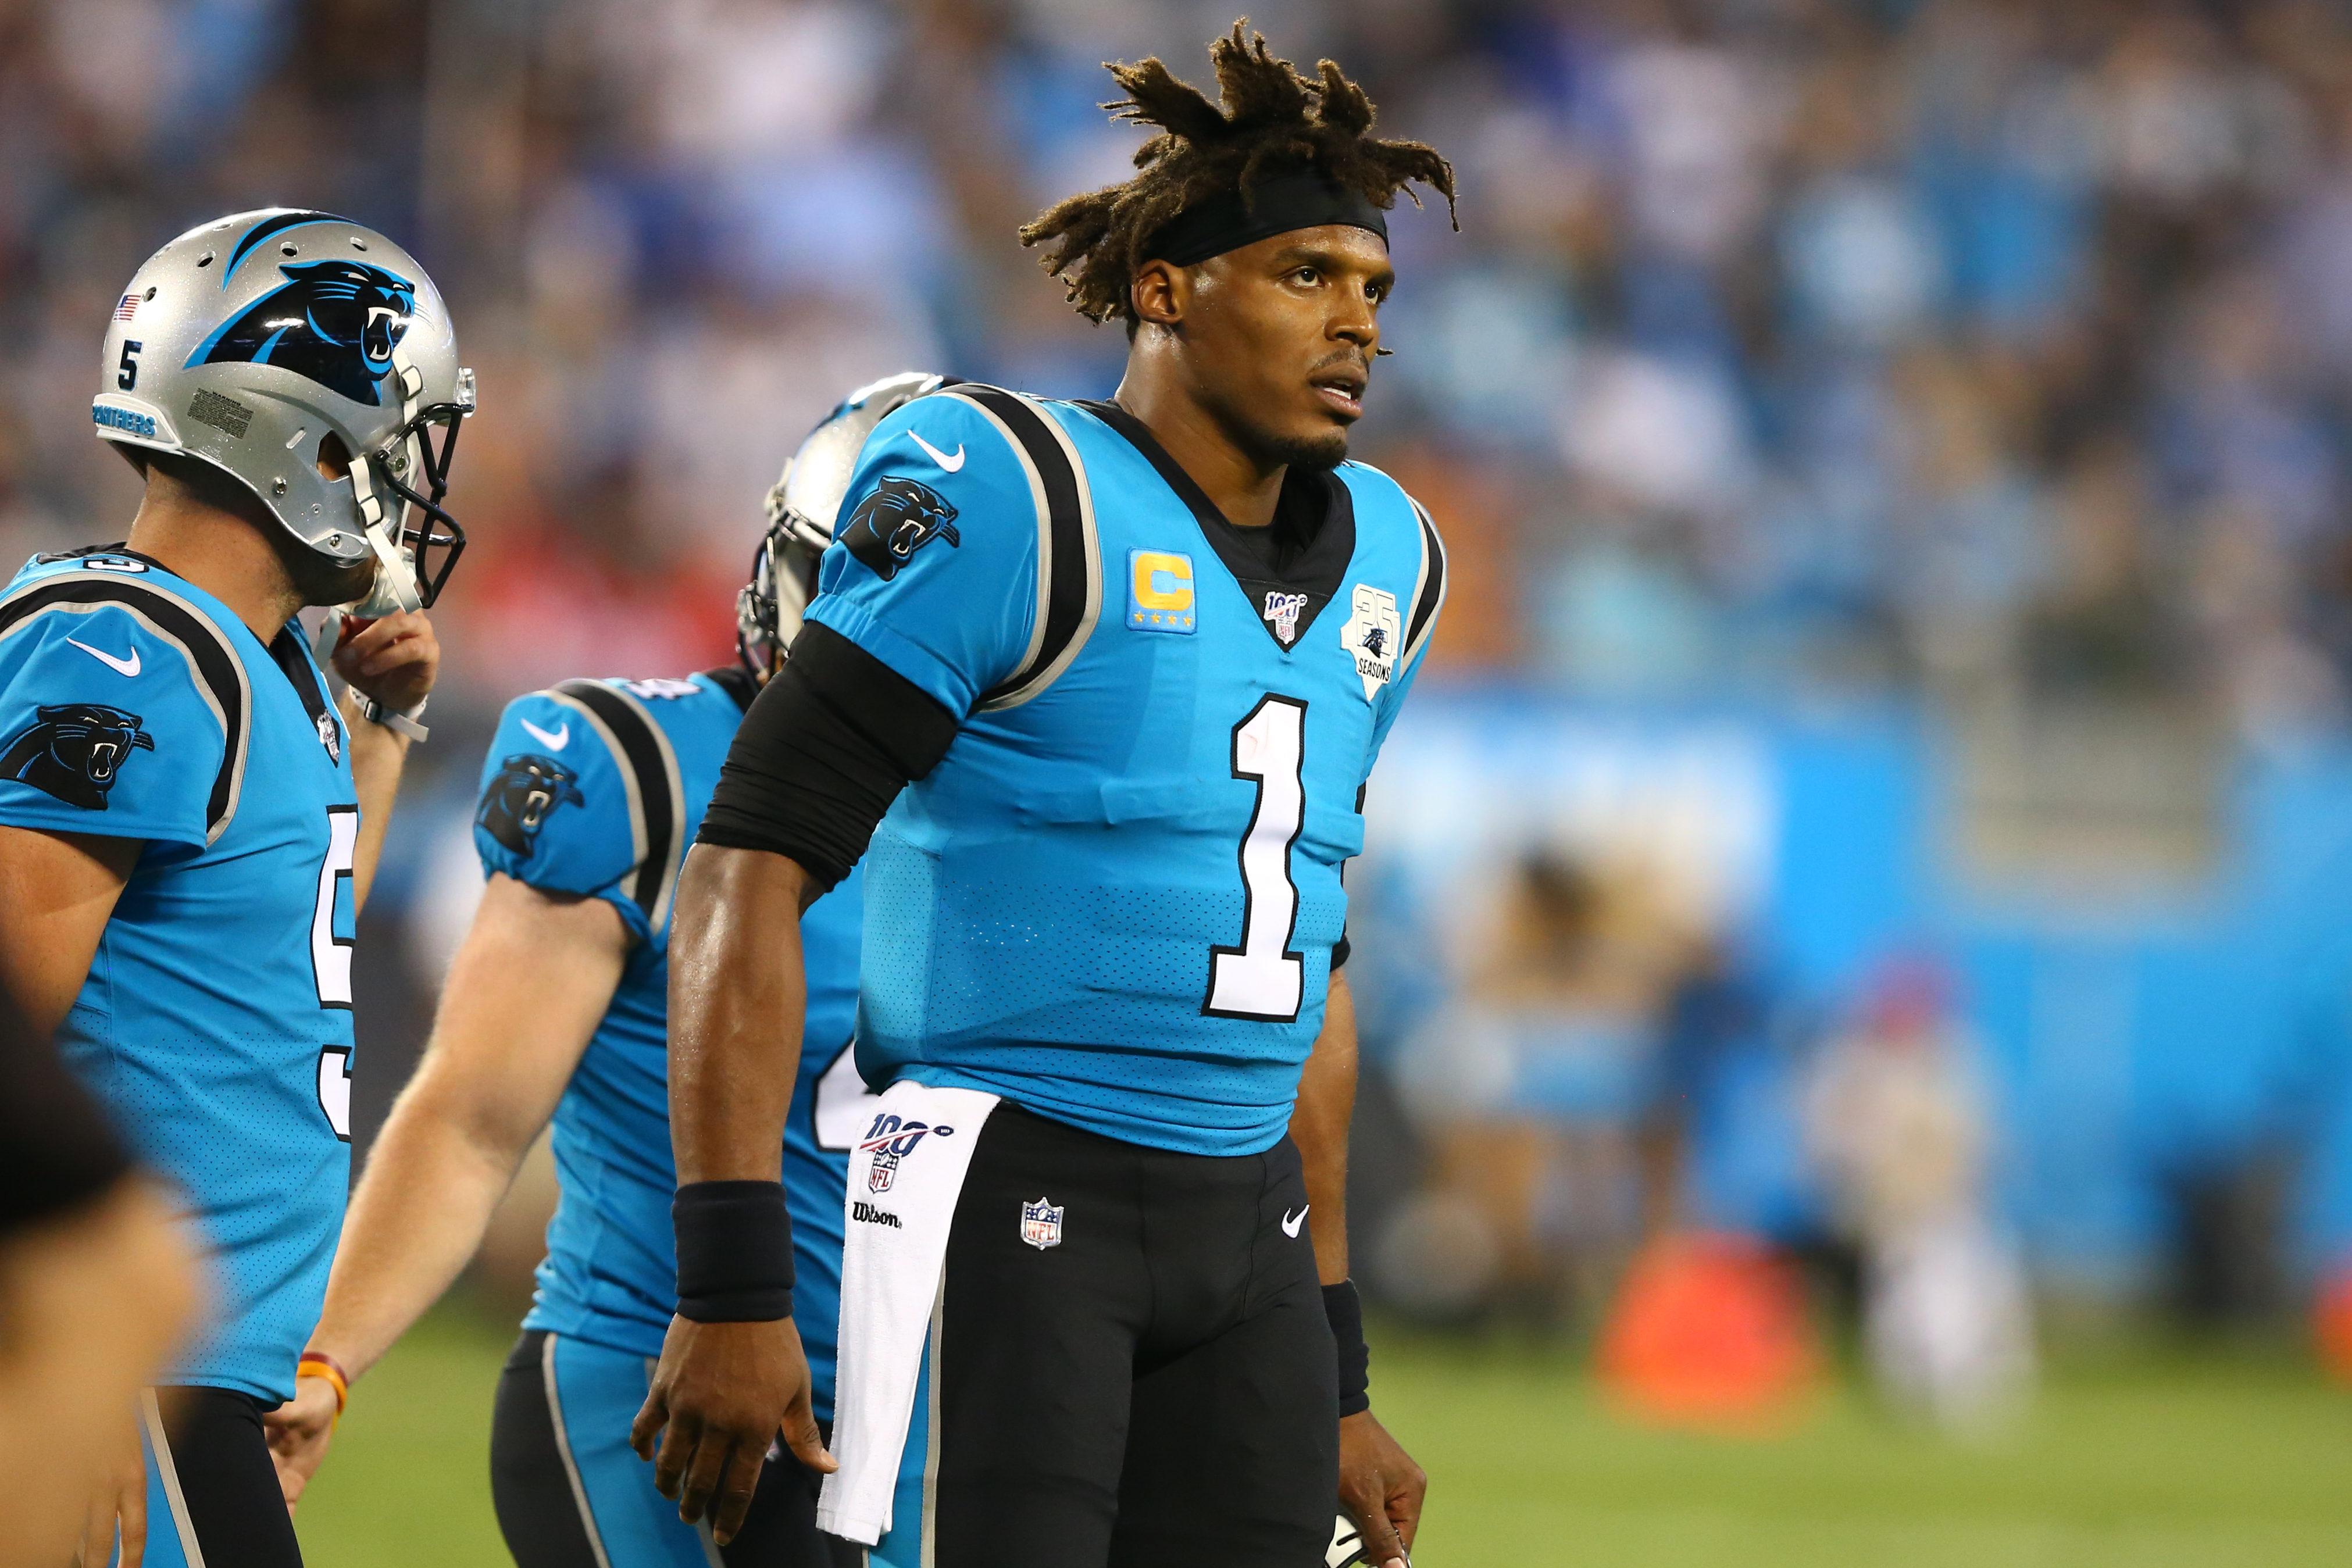 Even Cam Newton doesn't believe he's won Patriots starting QB job yet